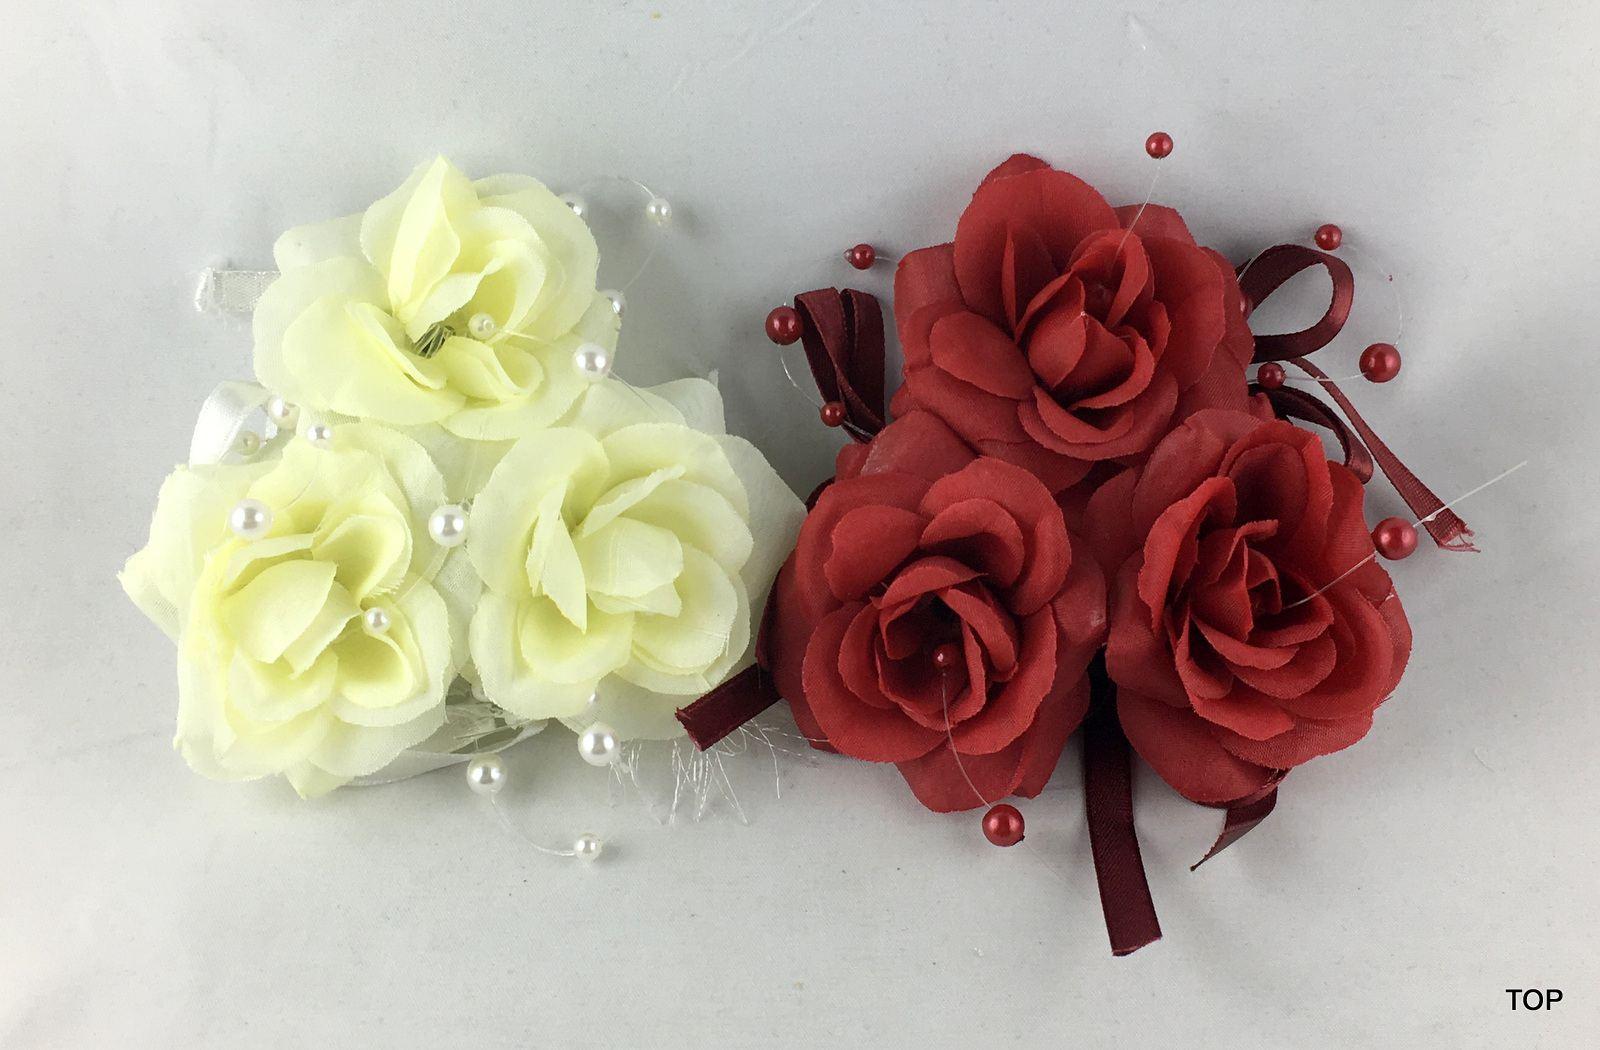 Variante Rosen Rot Rosen Rot Rosen Kerzenring Tischdeko Kerzen Kranz Zwei Verschiedene Farben